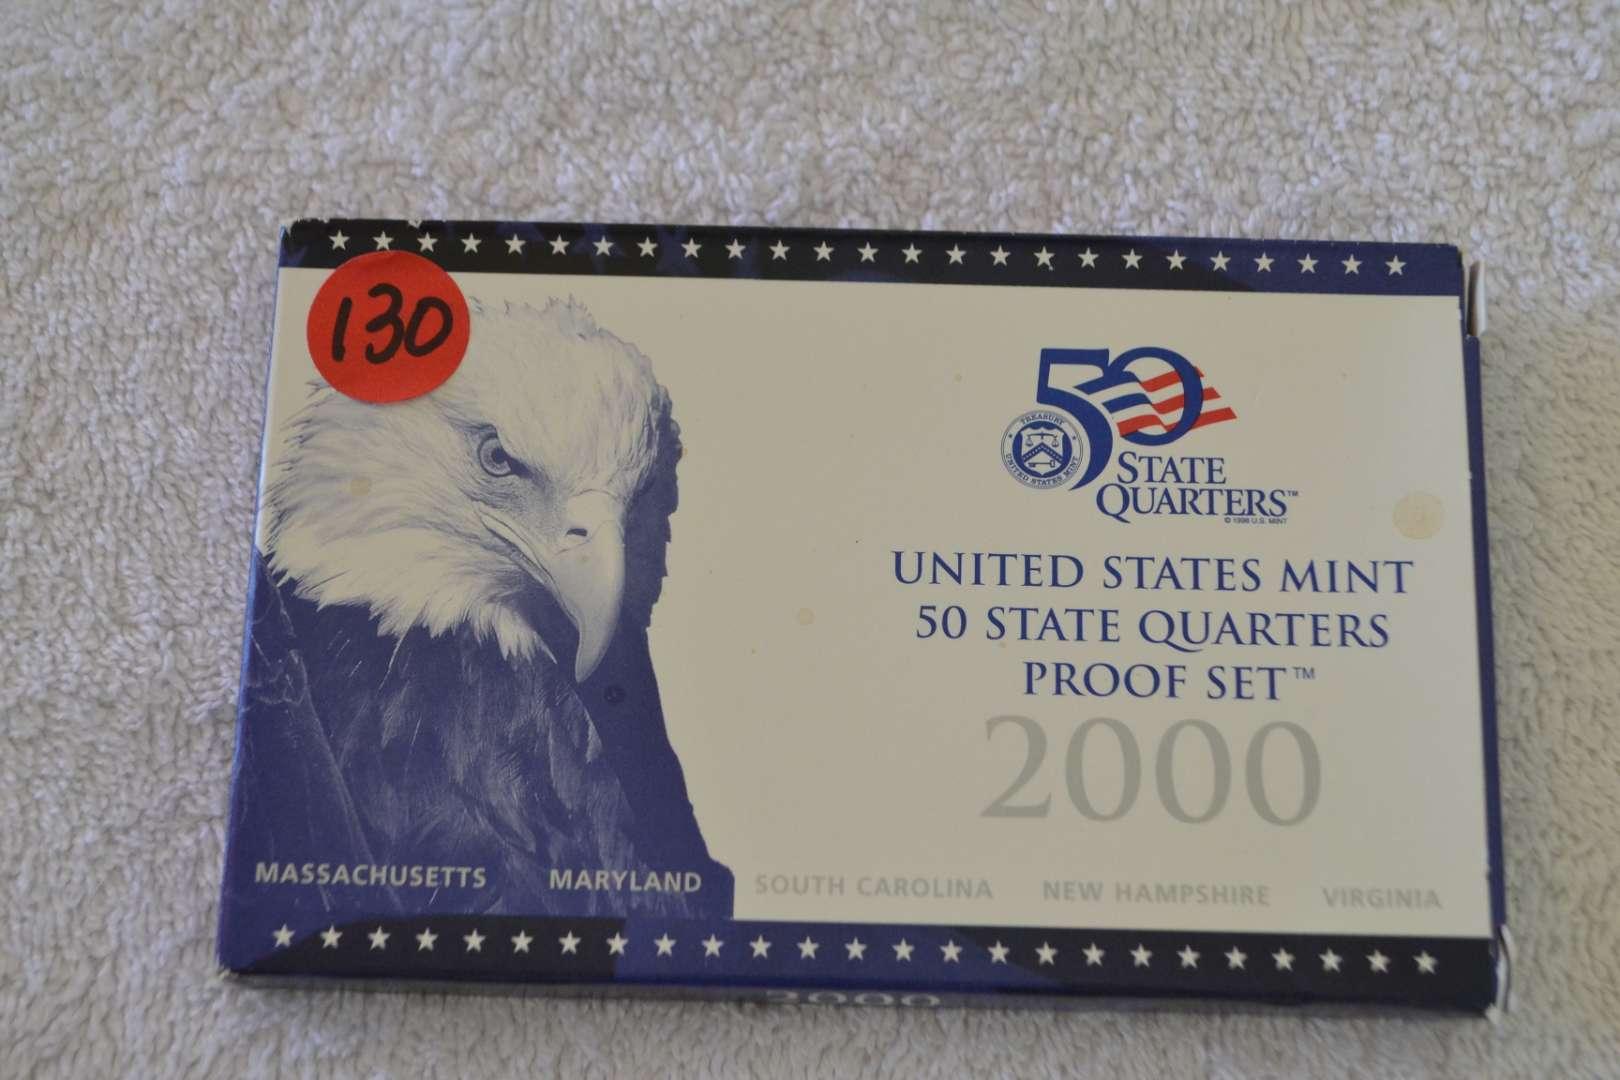 Lot # 130 2000 UNITED STATES PROOF SET